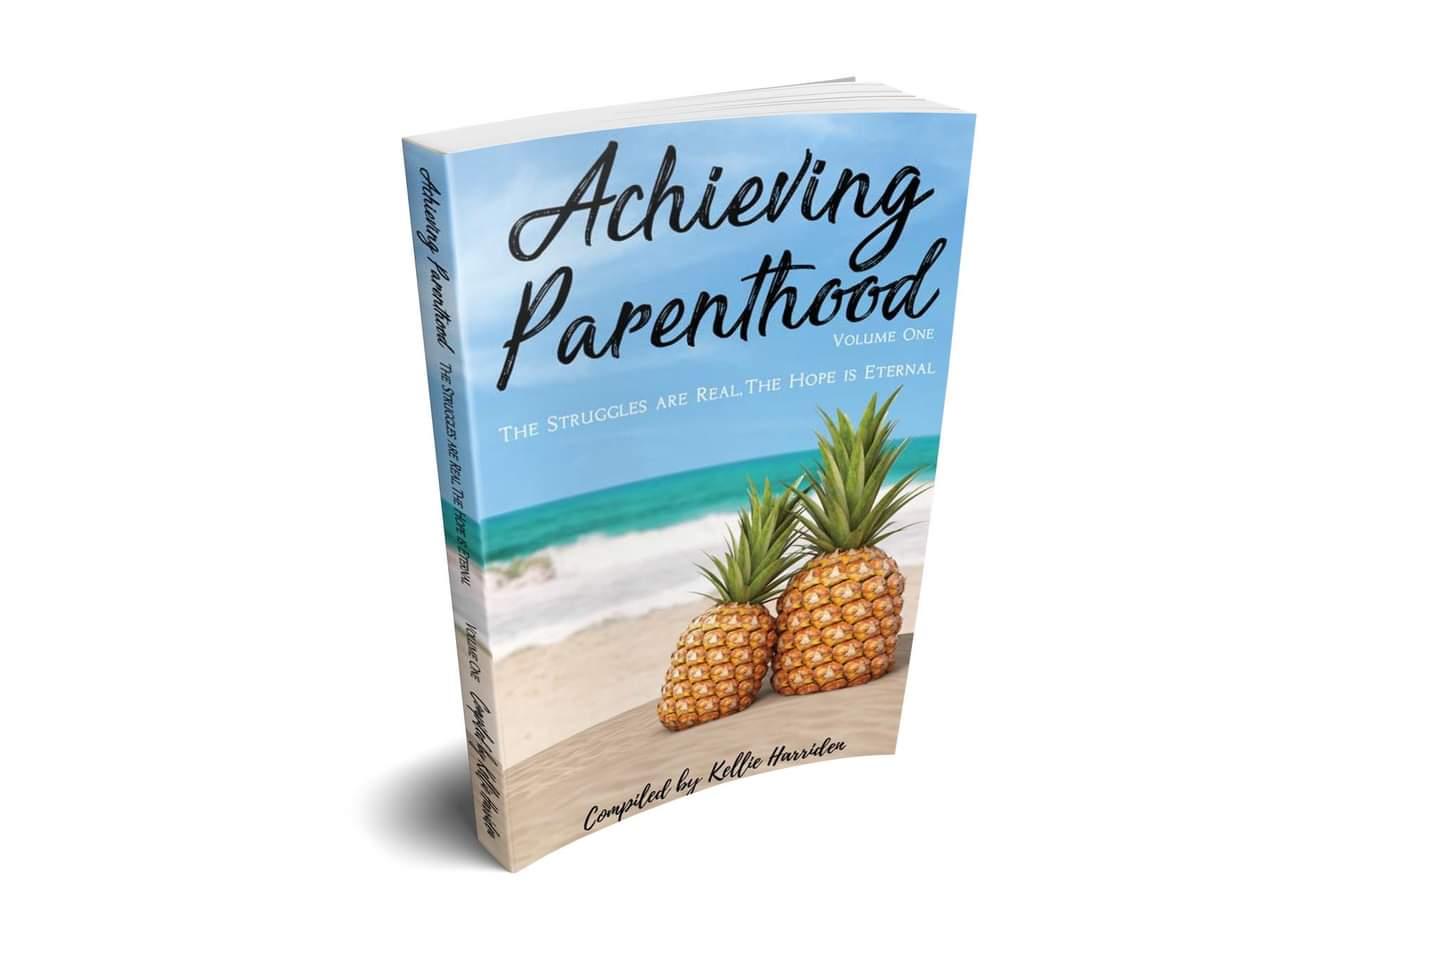 Achieving Parenthood